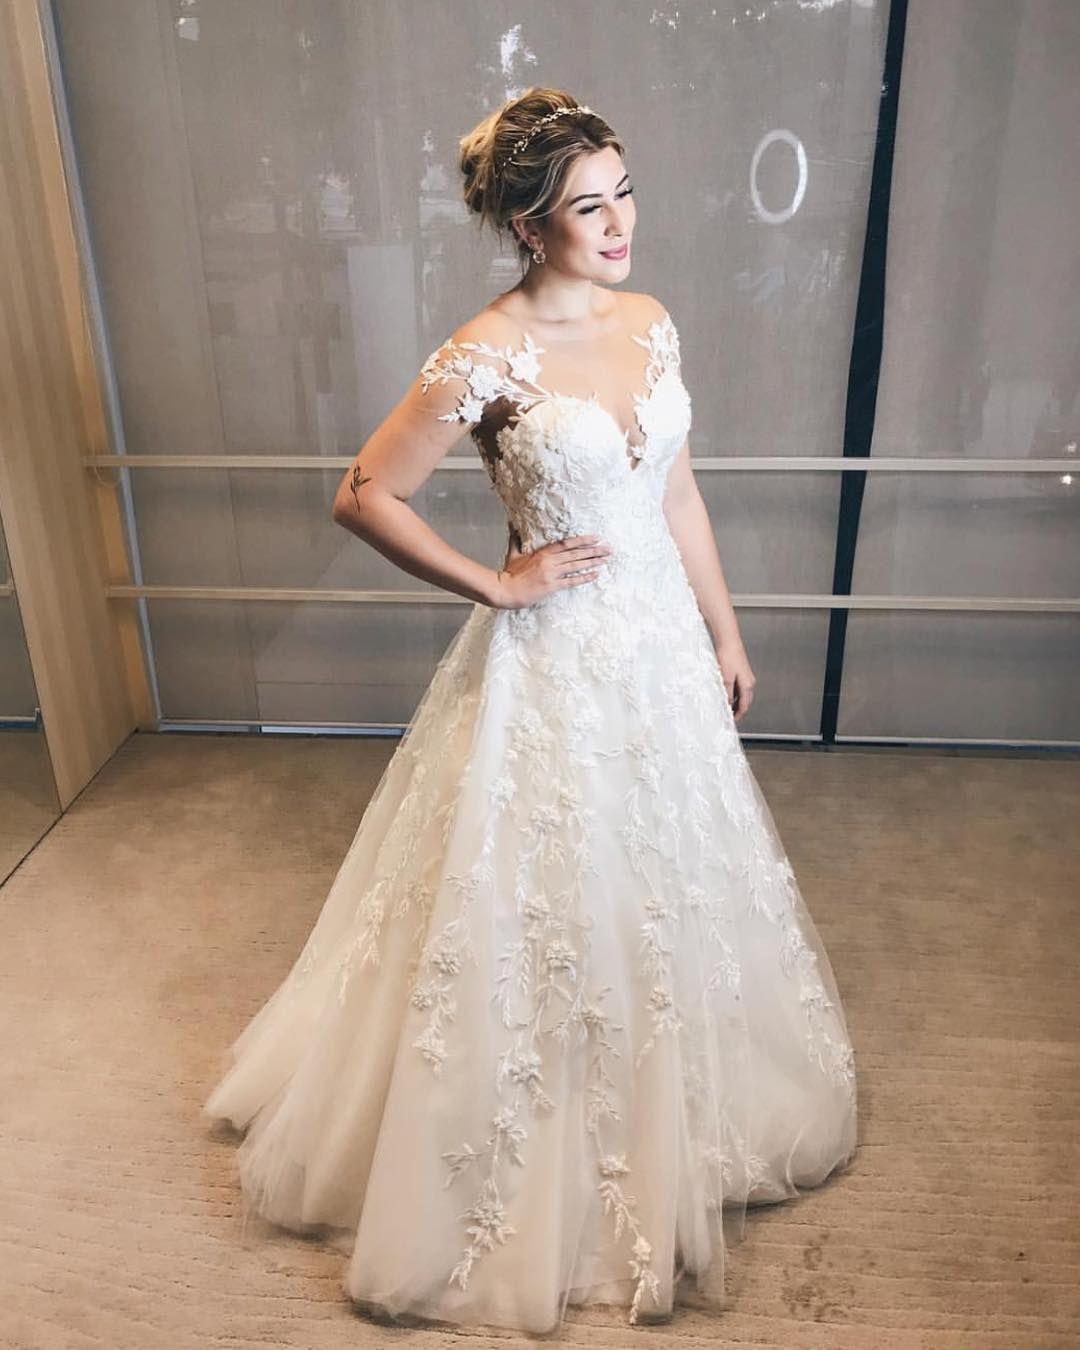 a0190eda0 Vestido de Noiva  Dress   bride  dress Noiva  Niina Secrets  Princesa   Casamento  marriage